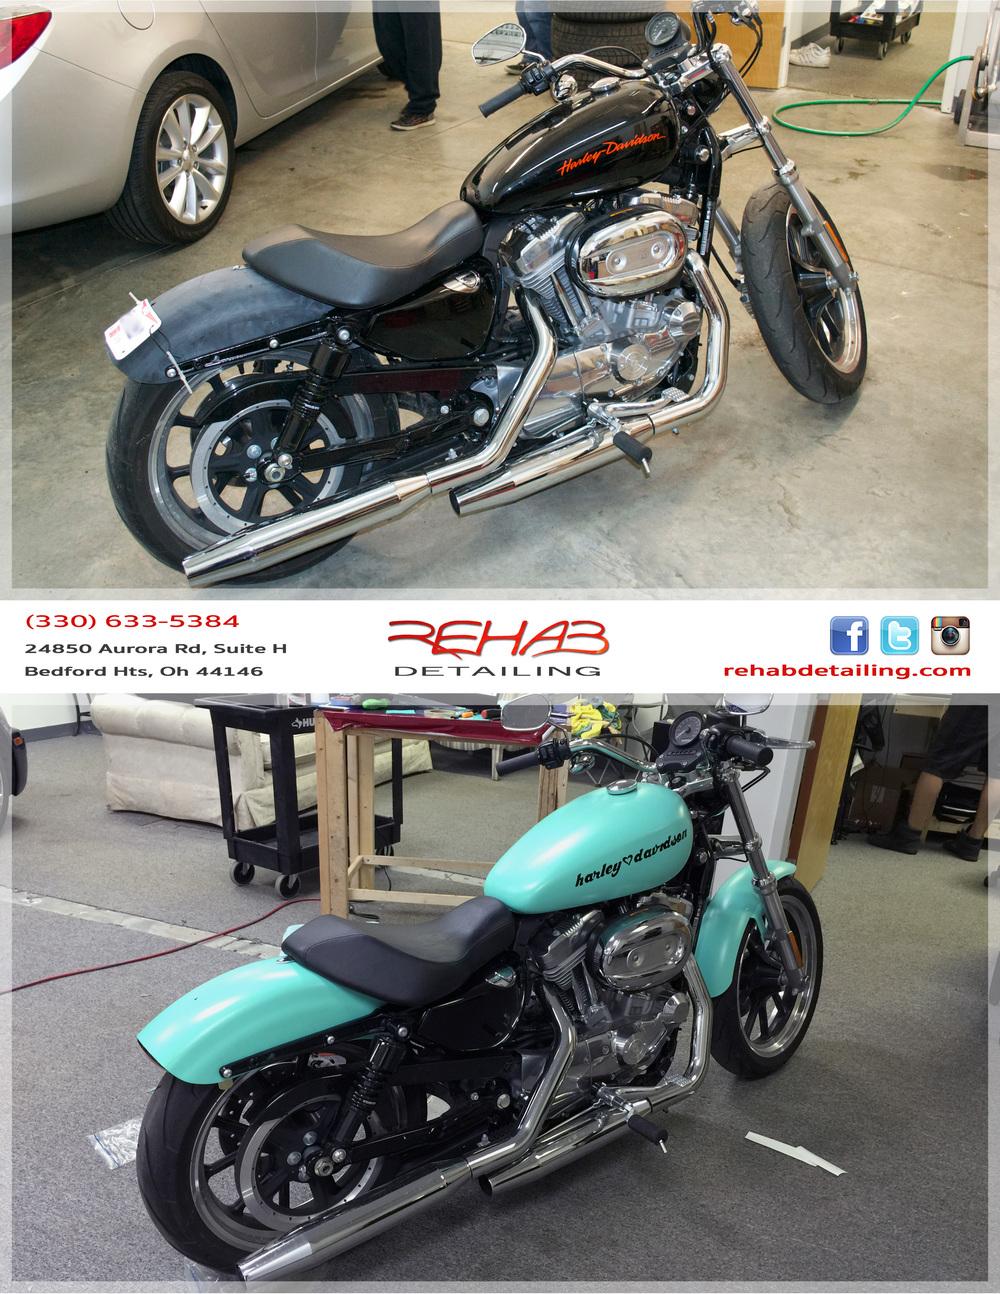 2014 Harley-Davidson 883 Sportster Ultra Low